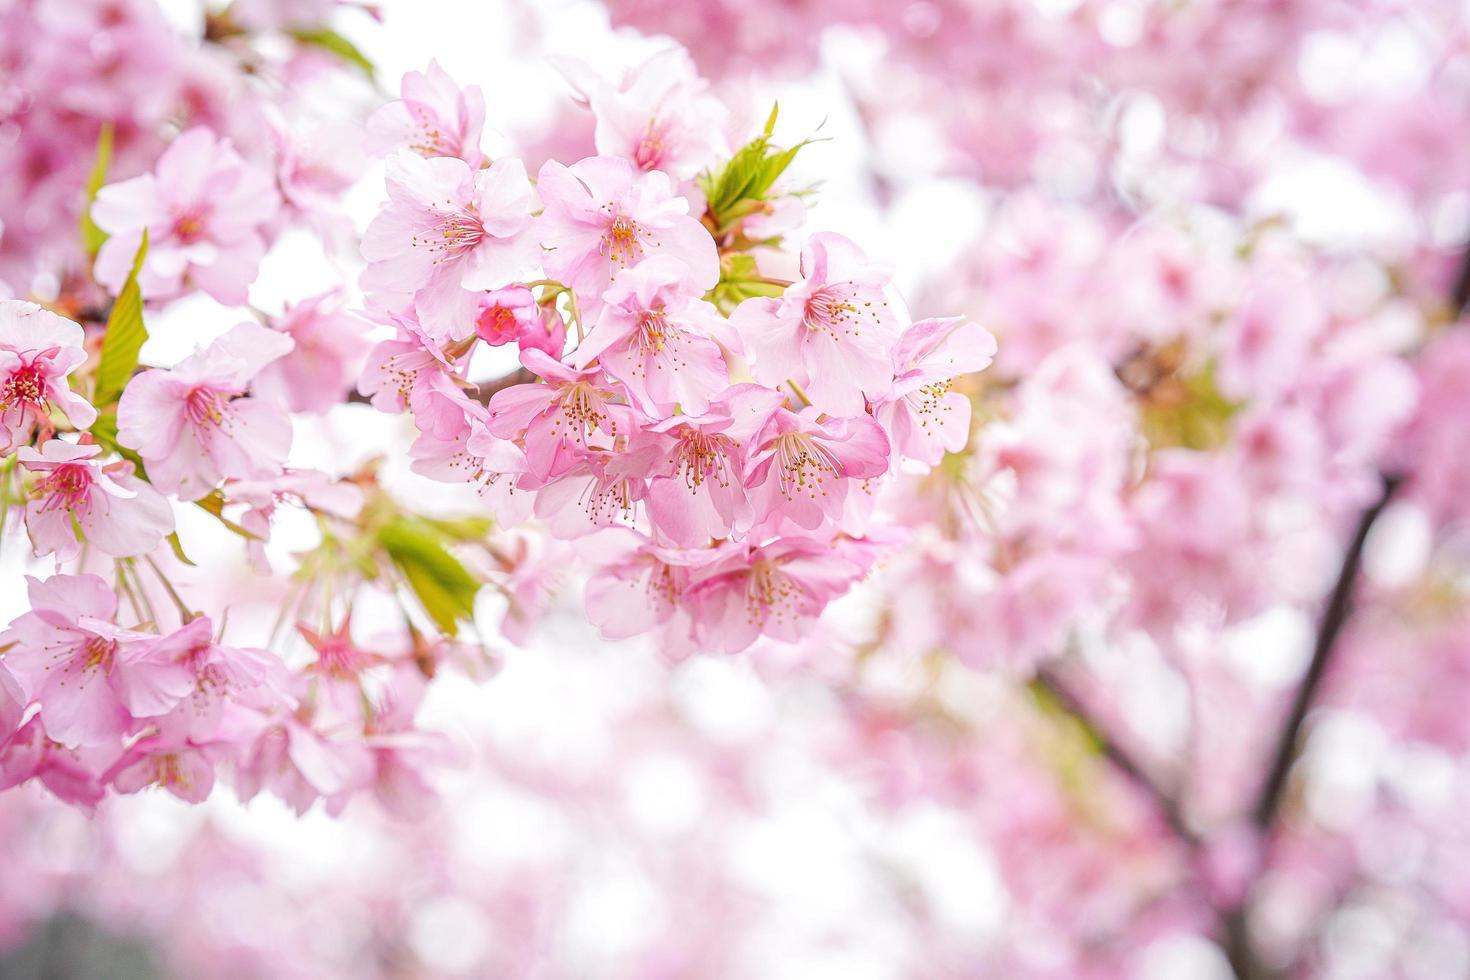 roze sakura kersenbloesem bloem foto